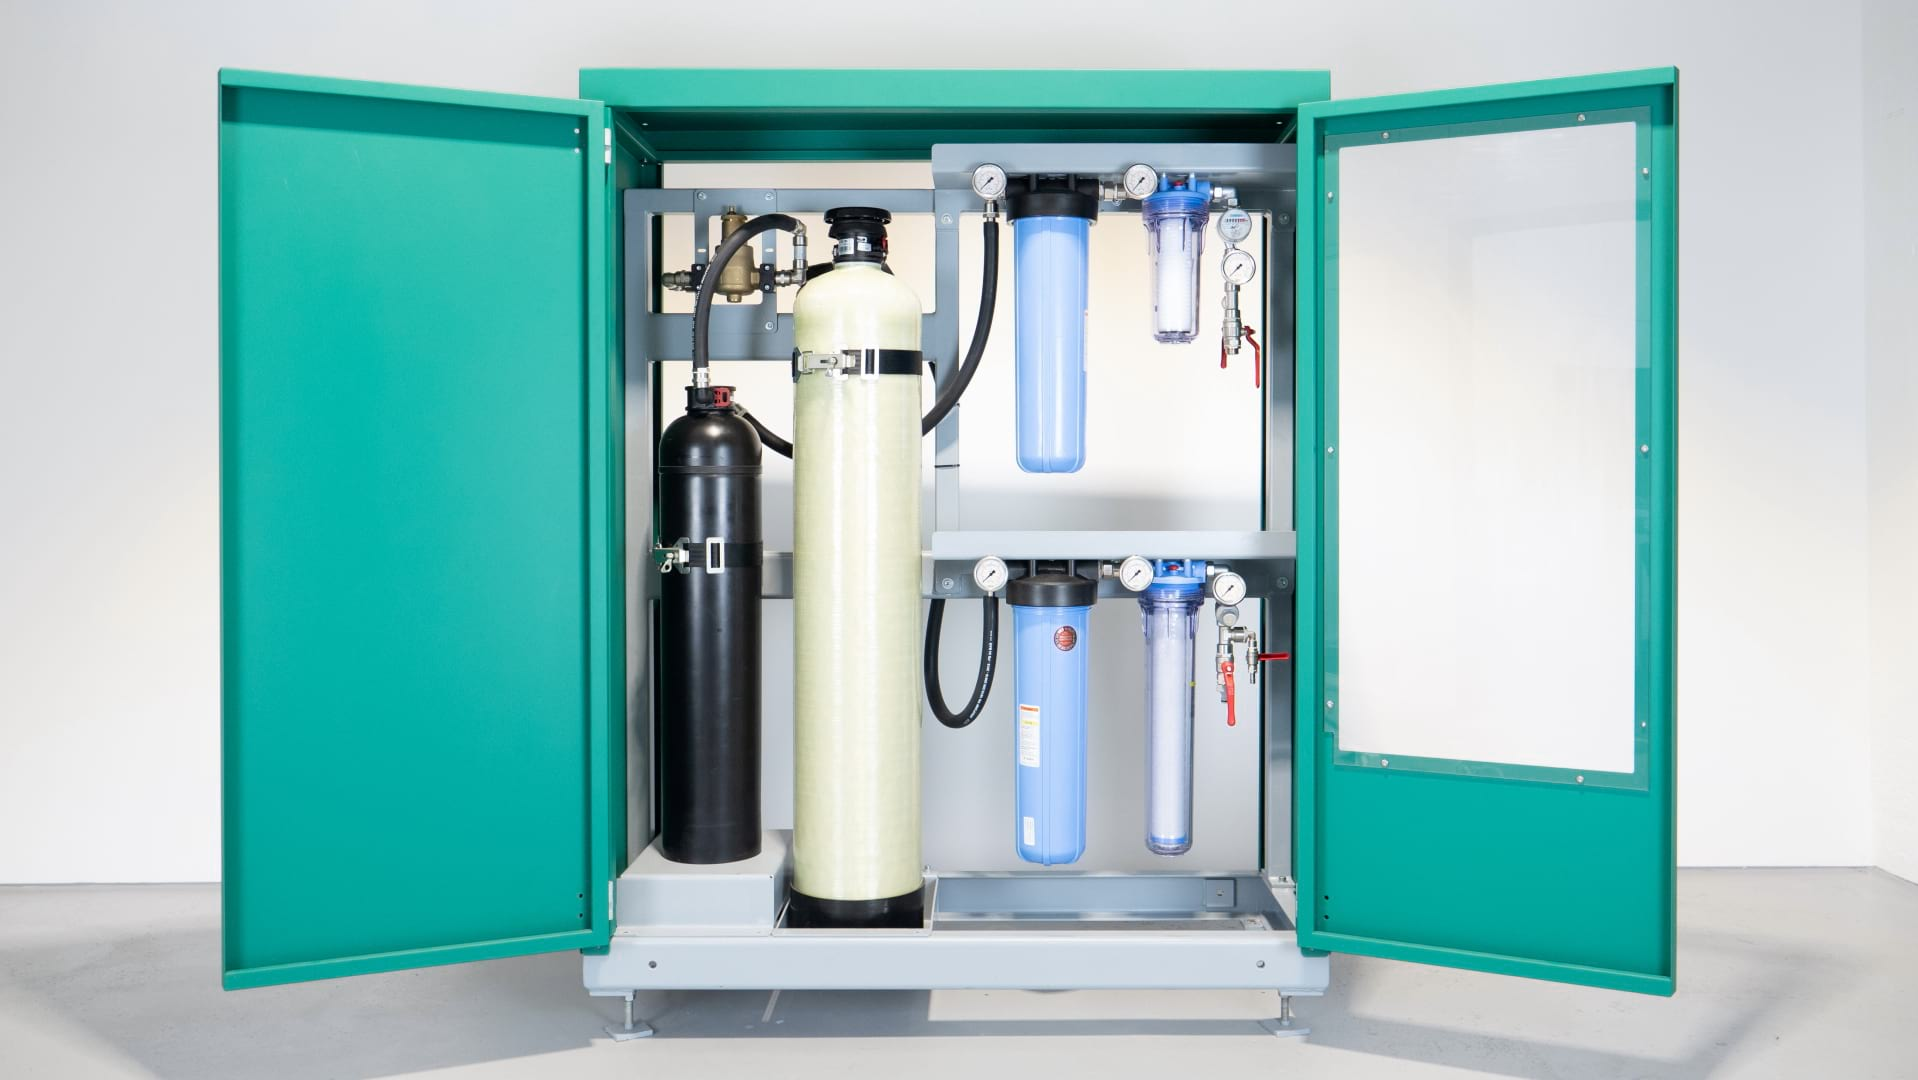 January Sale 2021 - Waterjet Production Academy GmbH